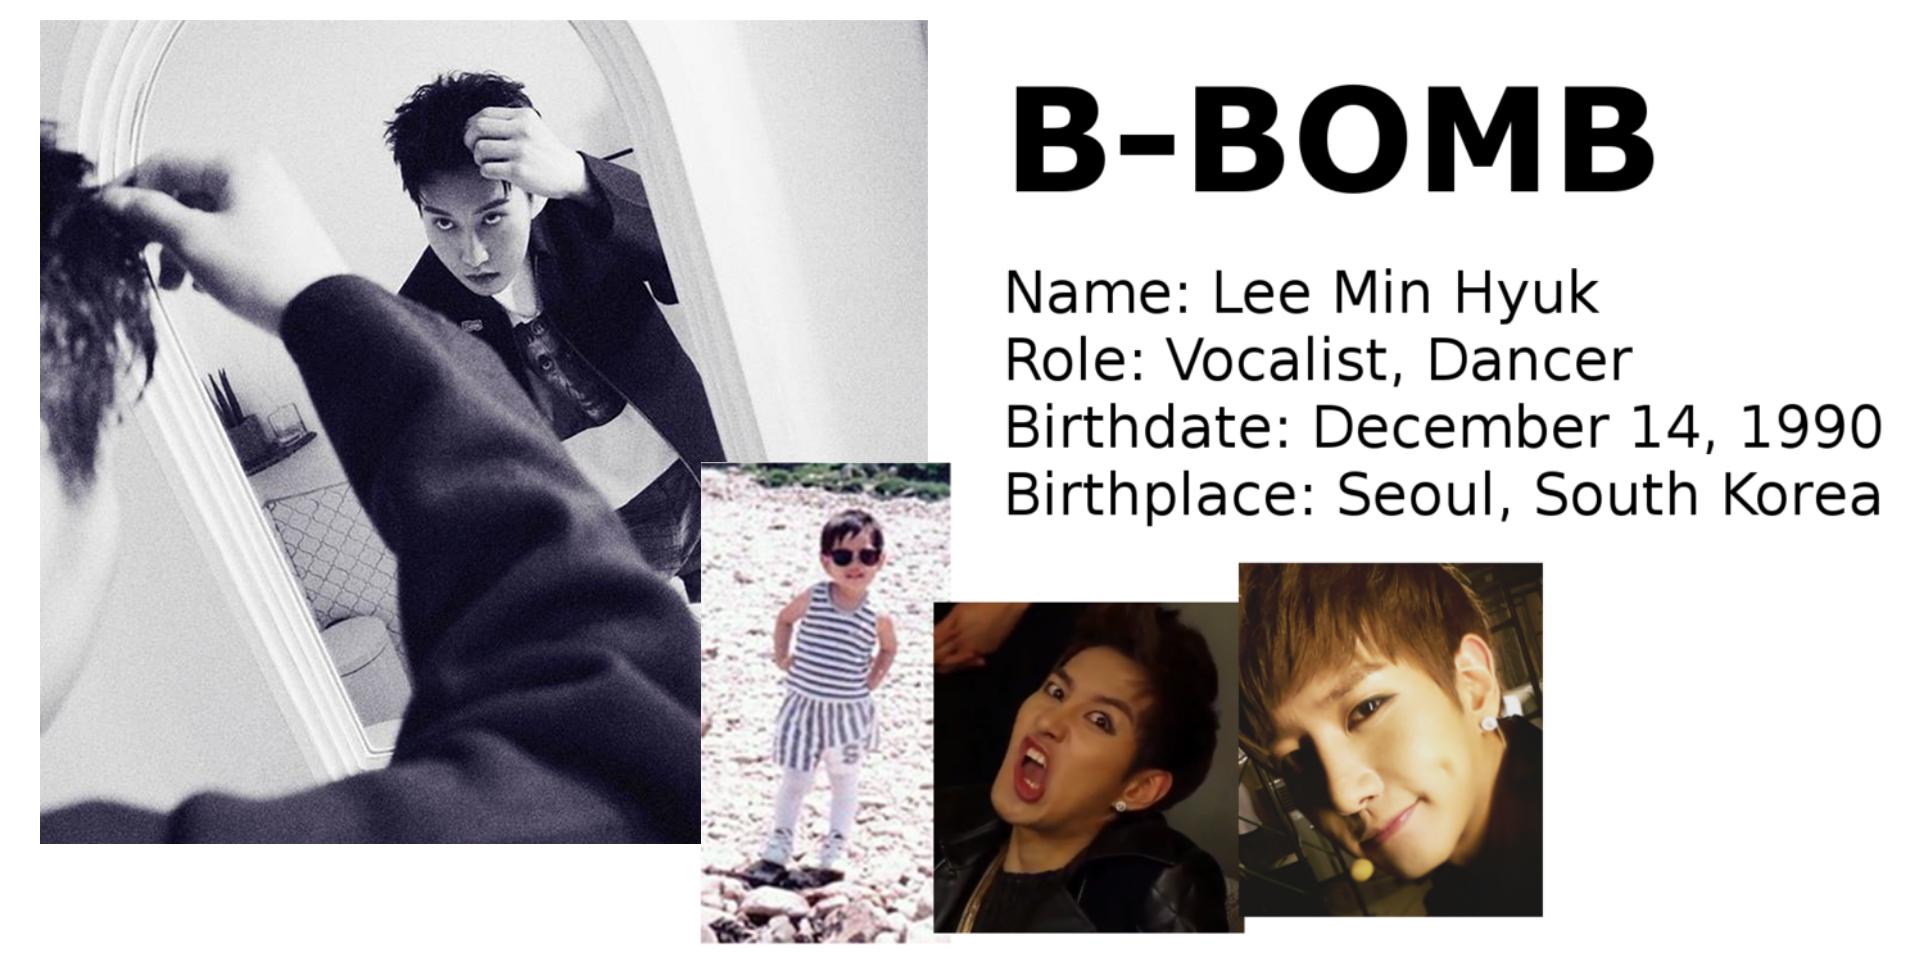 B-Bomb Block B singer dancer Korean songs profile Block B: Zico, Park Kyung, Jaehyo, P.O, B-Bomb, U-Kwon, Taeil rapper songs Korean K-pop K hip hop hep hap Bastarz profile mitglieder membres member tattoo personalities personality maknae age oldest youngest